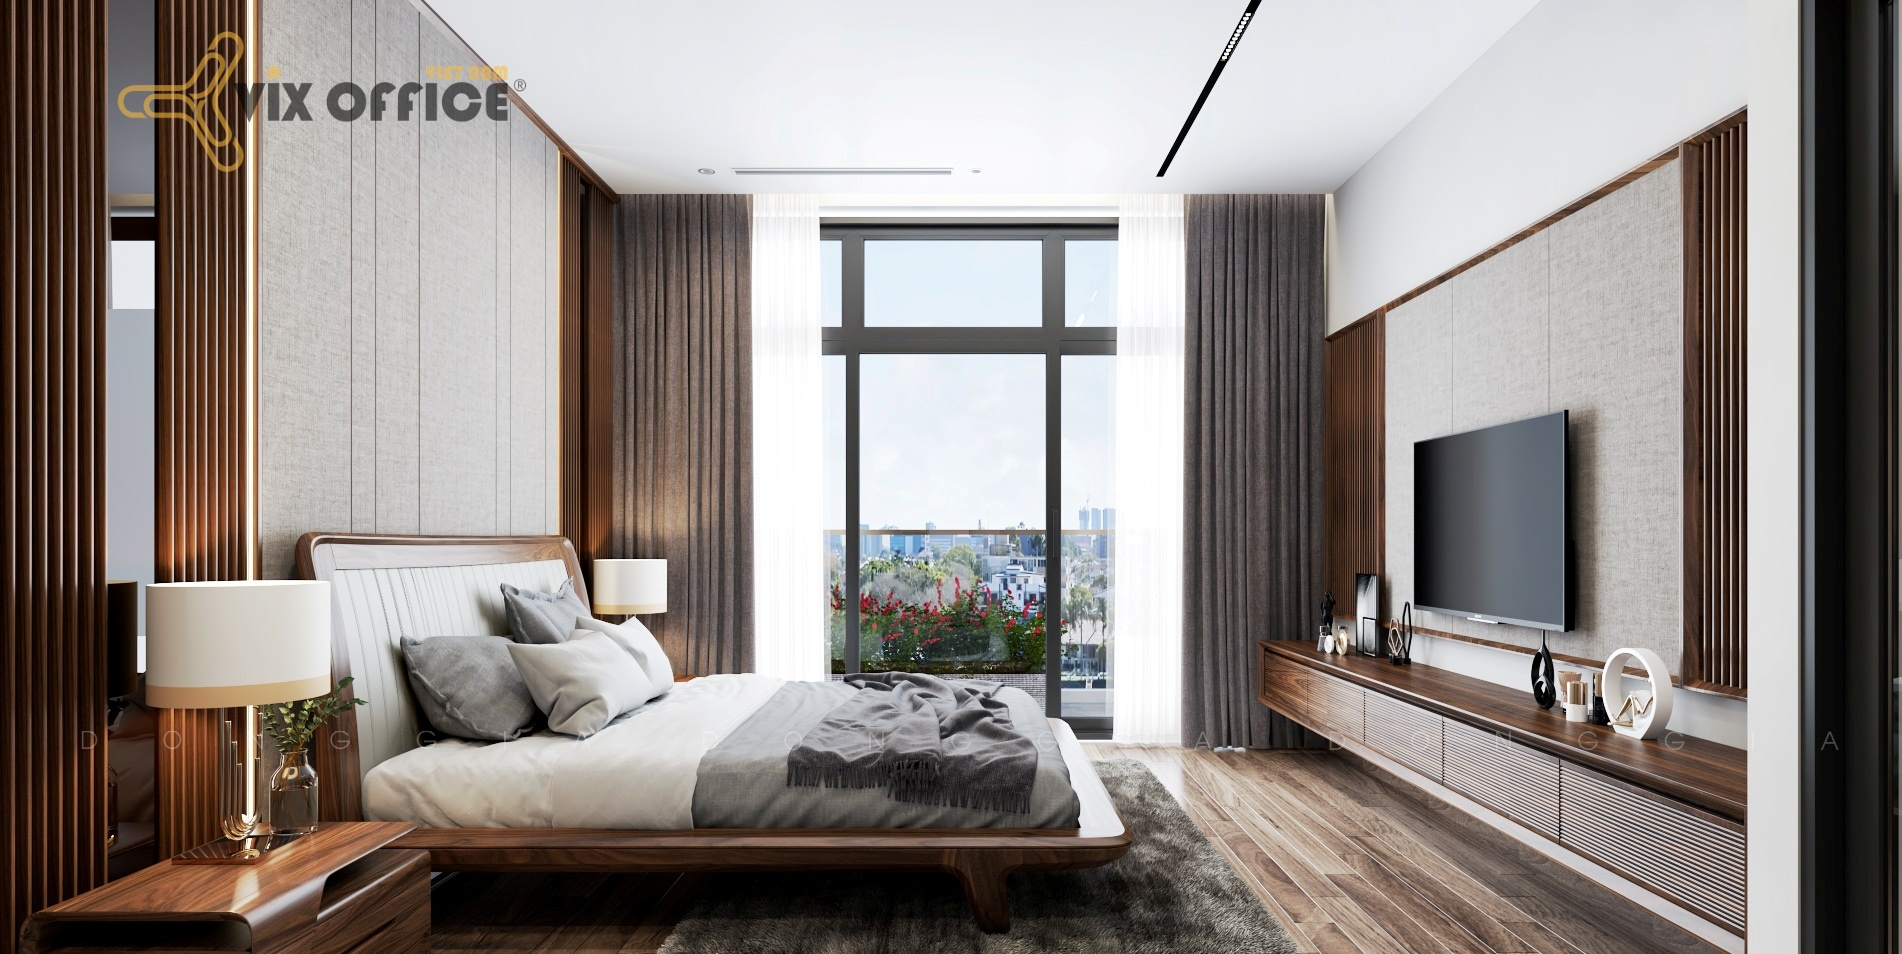 Bedroom design must ensure comfort and convenience